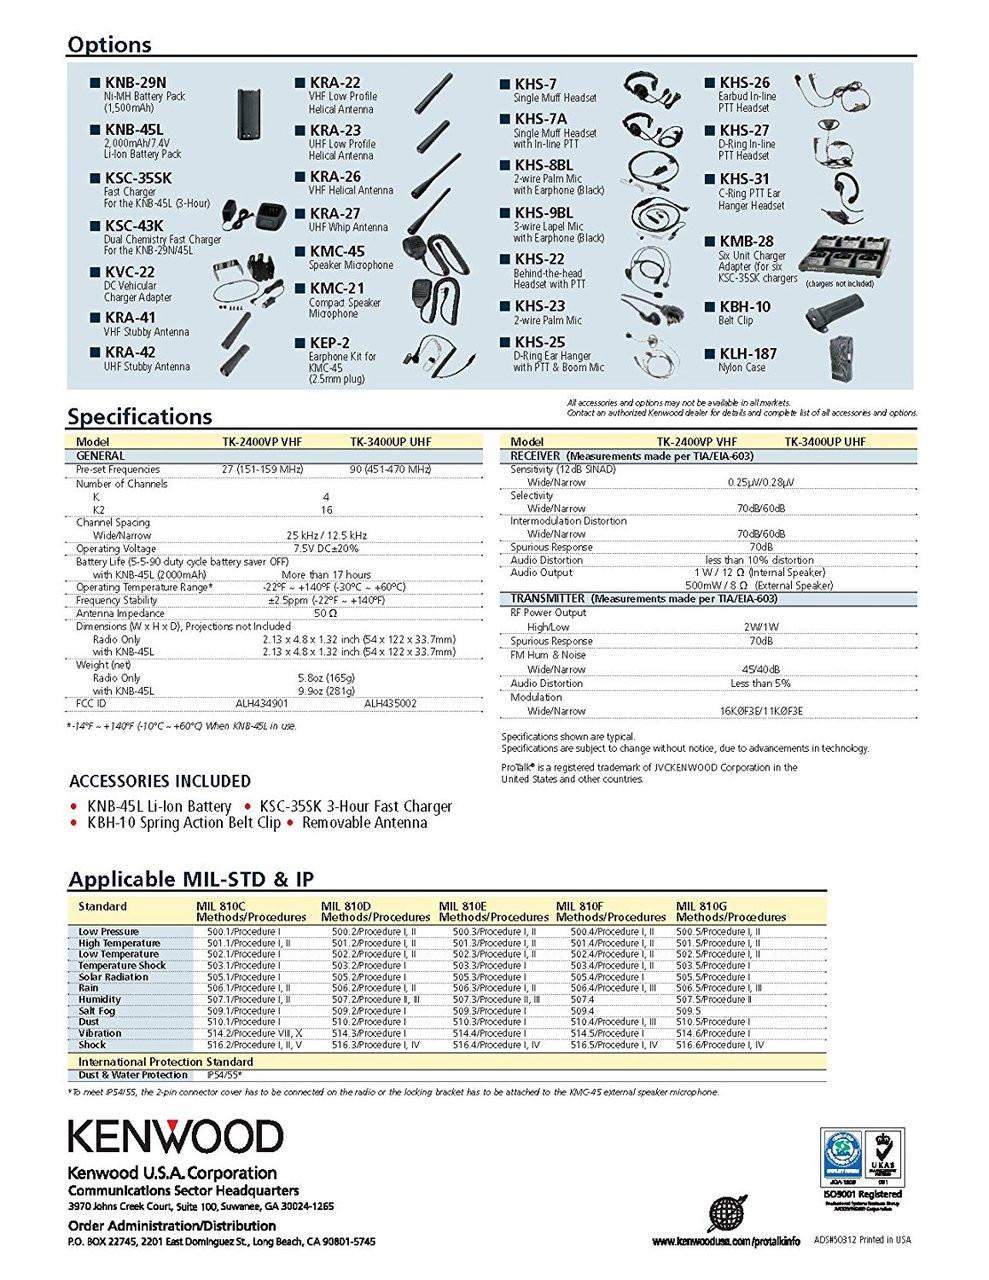 Kenwood ProTalk TK3402U16P 5 Watt 16 Channel UHF Two Way Radio Spec Sheet Page 2 of 2